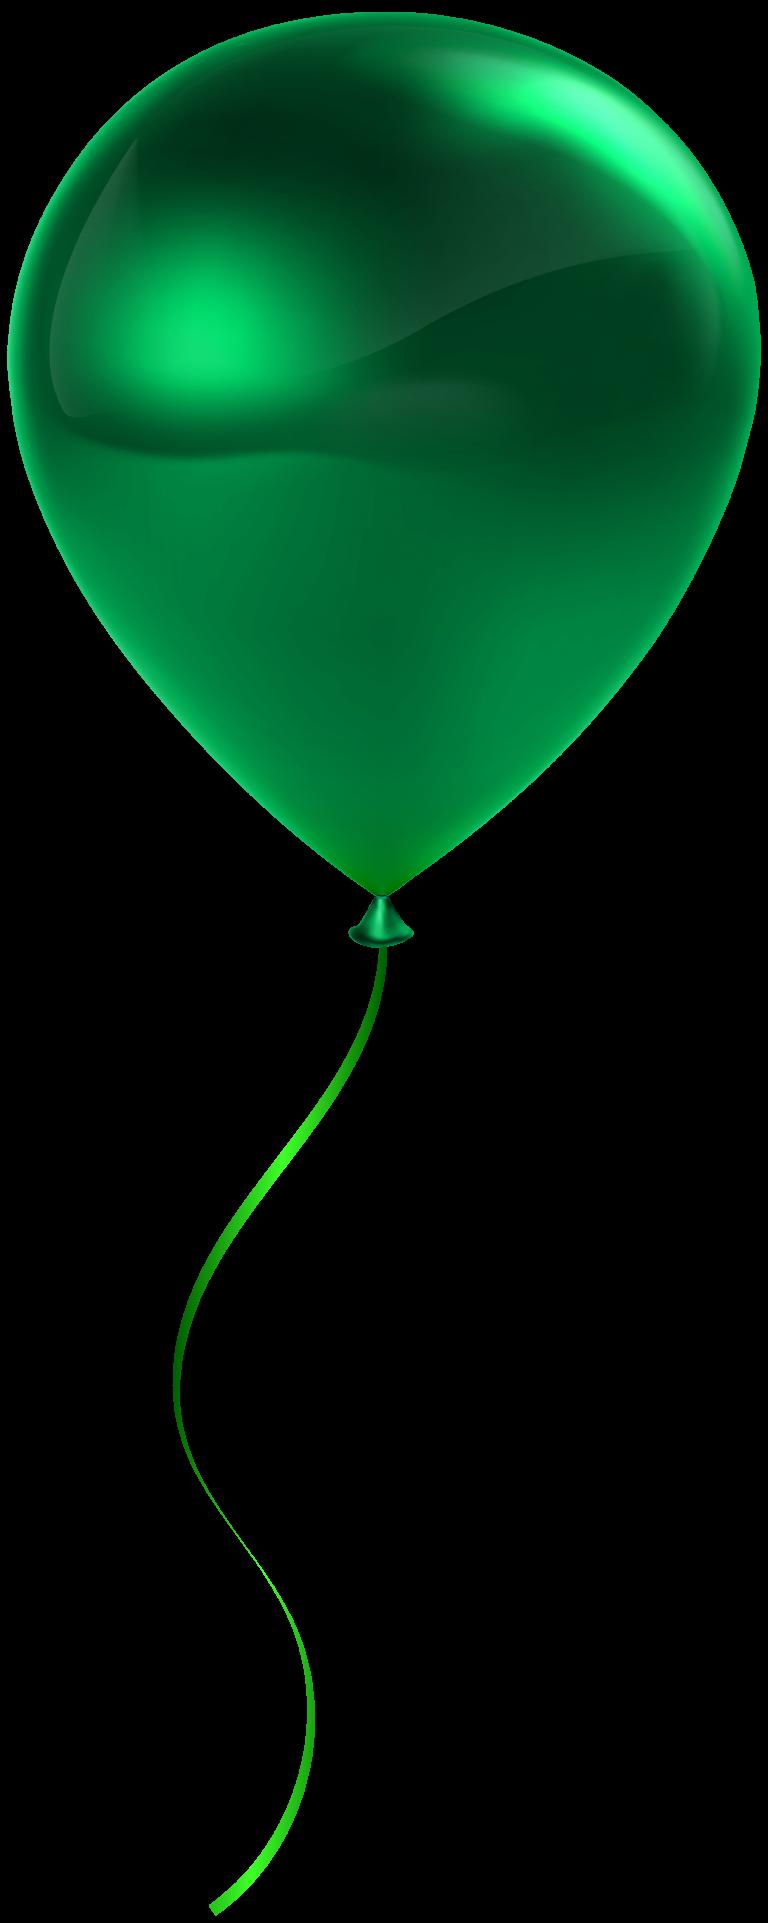 Green balloon collection png. Clipart balloons printable